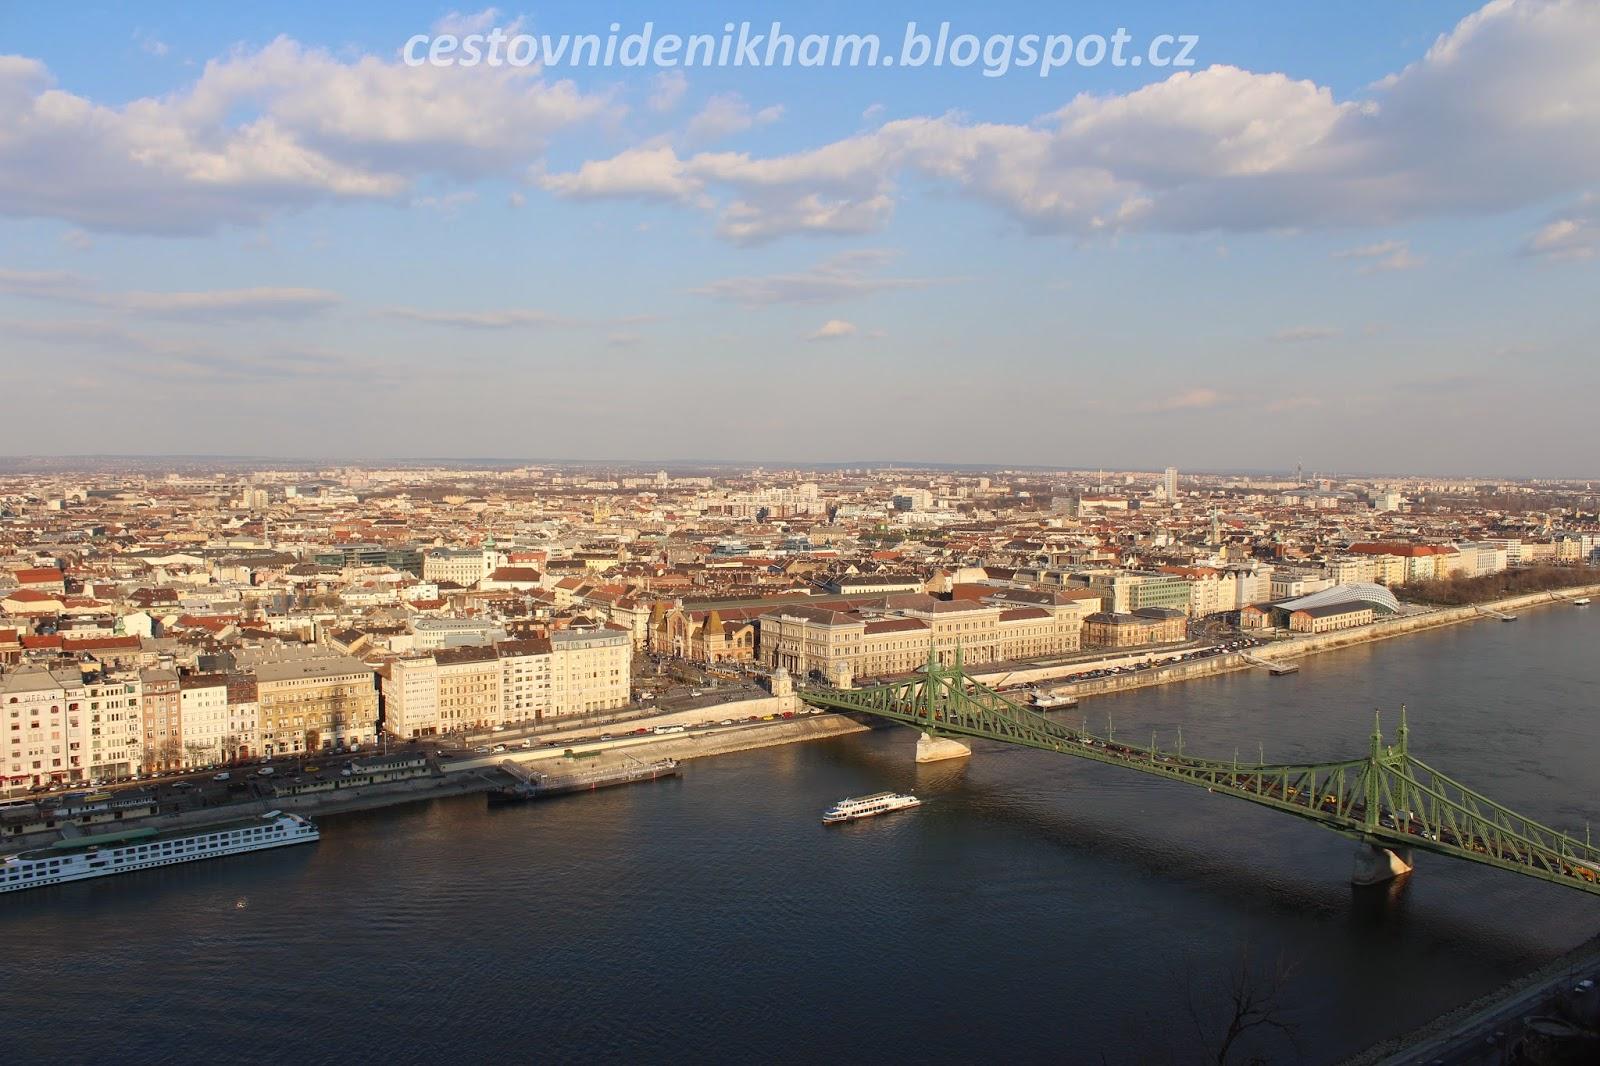 pohled na Budapešť z Gellértova vrchu // a view of Budapest from Gellért Hill